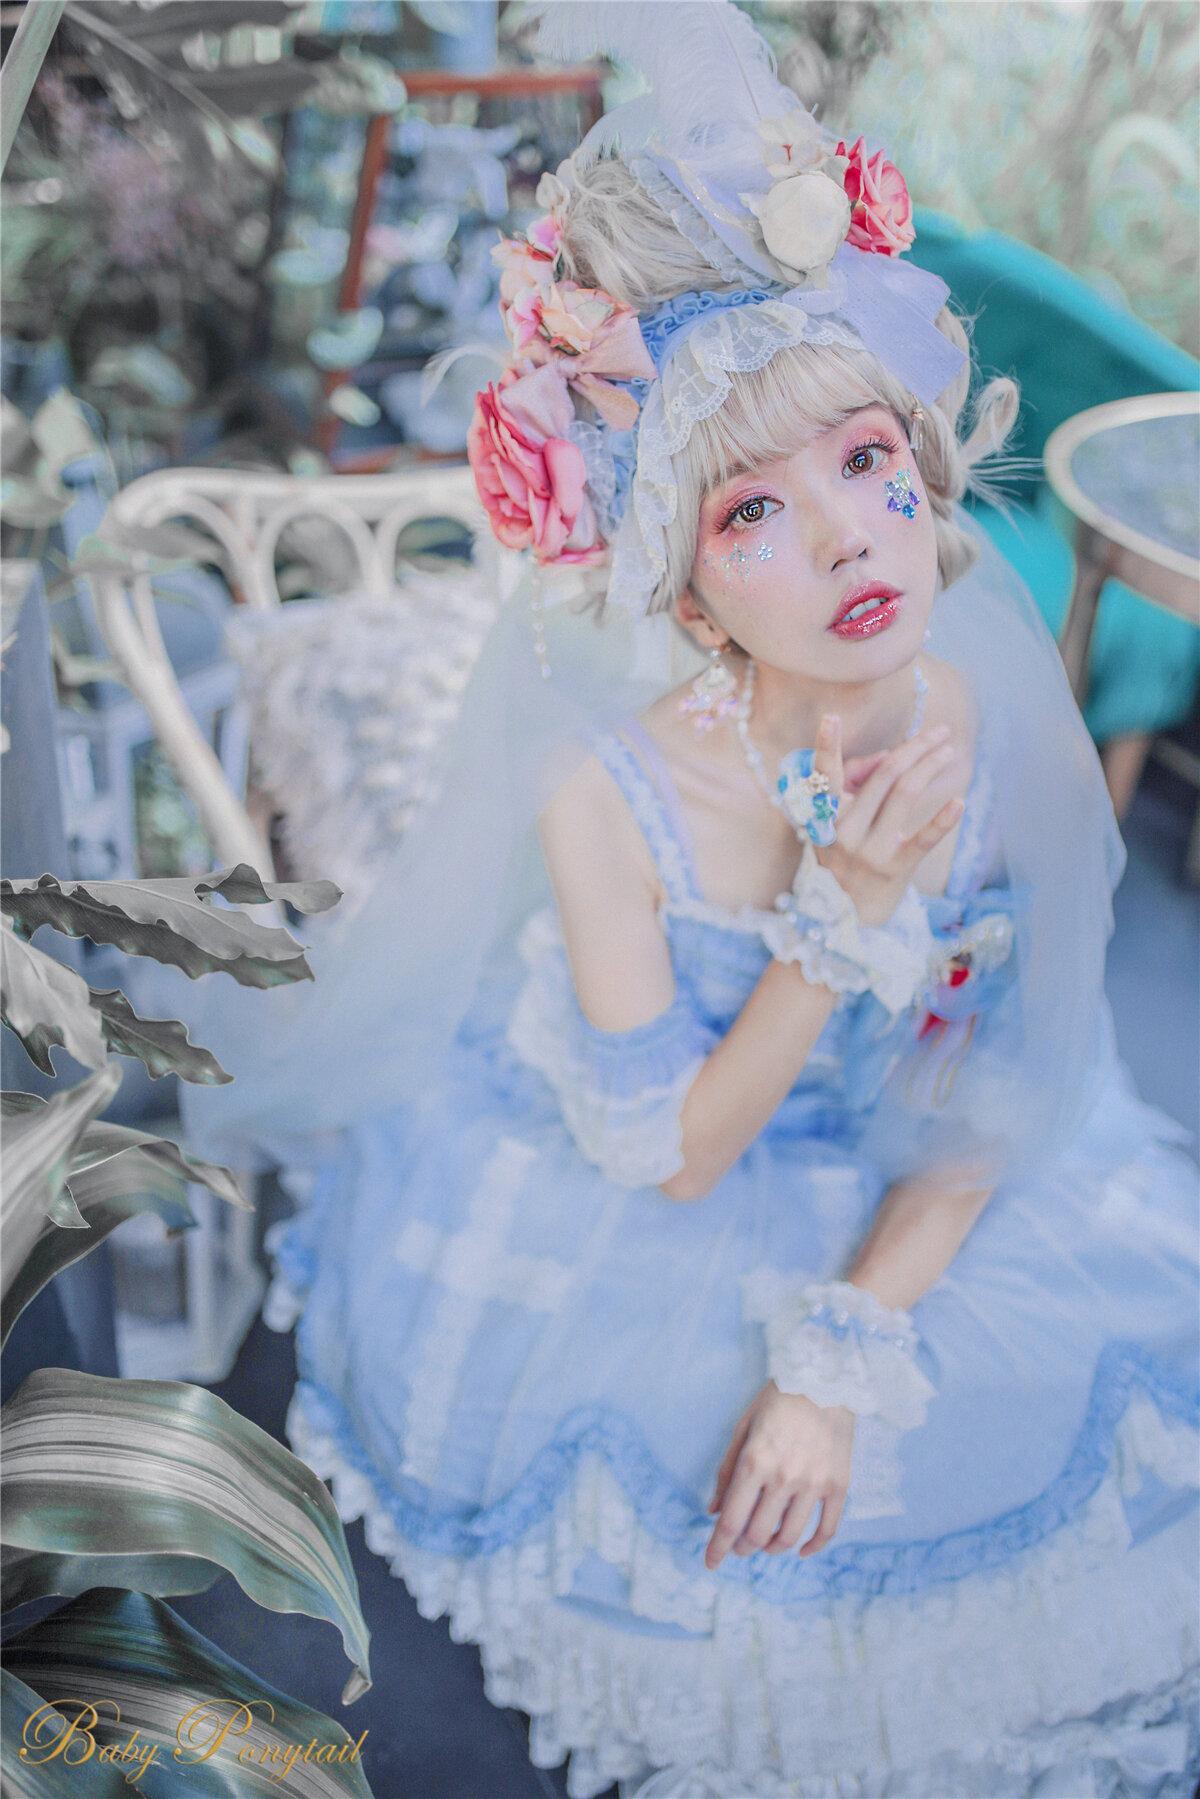 Babyponytail_Heavenly Teardrops_Model photo_JSK SAX_KAKA_21.jpg